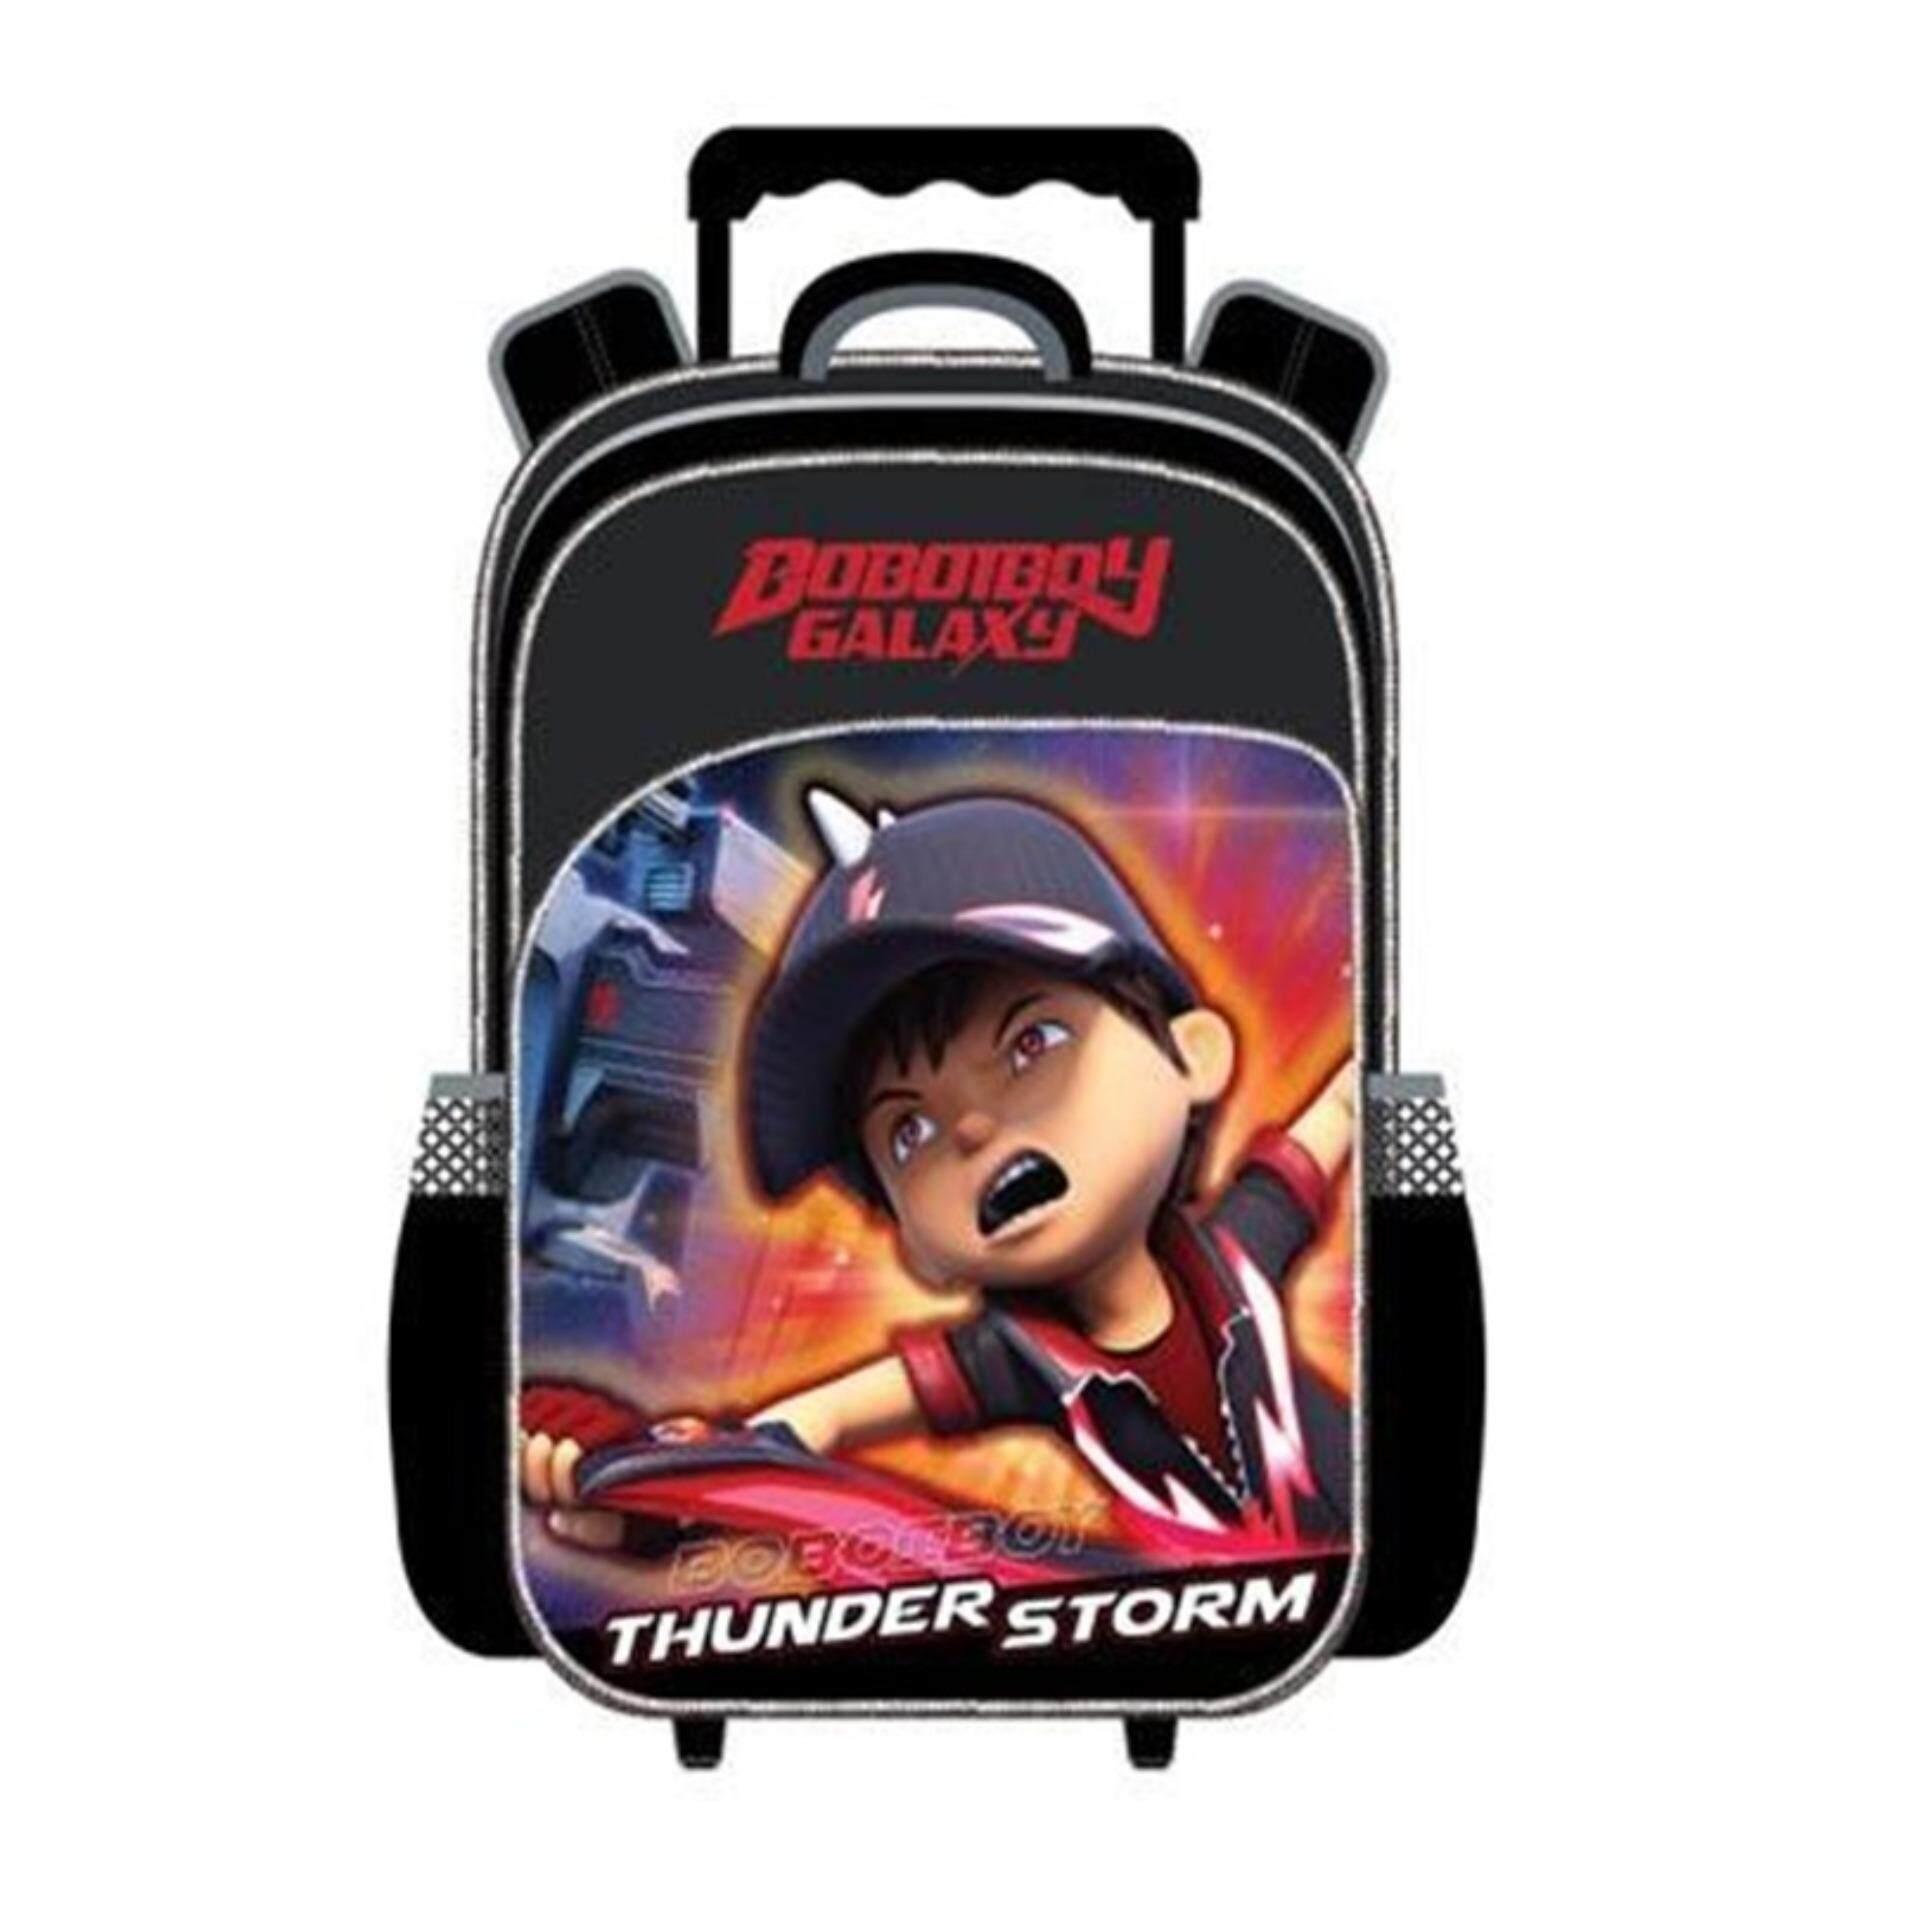 Boboiboy Galaxy Pre School Kindergarten Nursery Kids Children School Trolley Bag - Boboiboy Thunderstorm